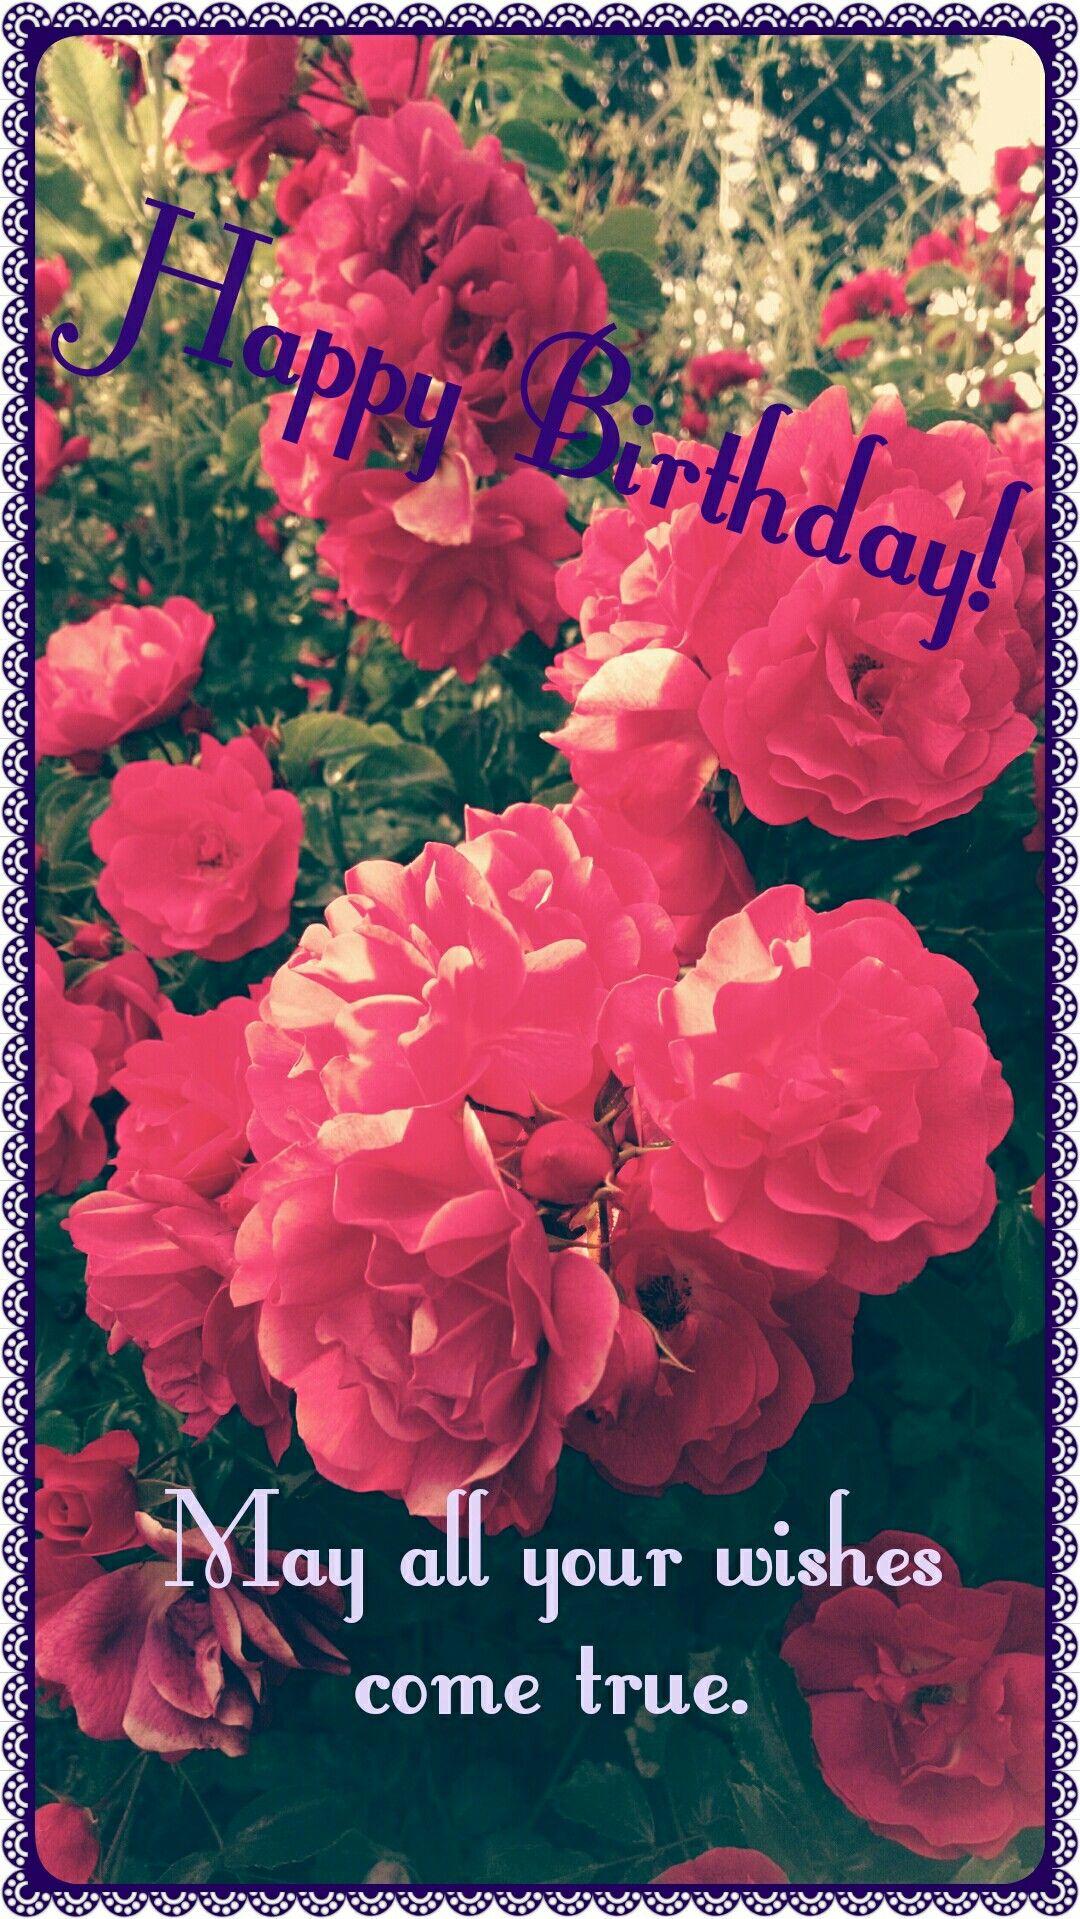 Pretty Flowers From My Garden Send A Good Happy Birthday Message